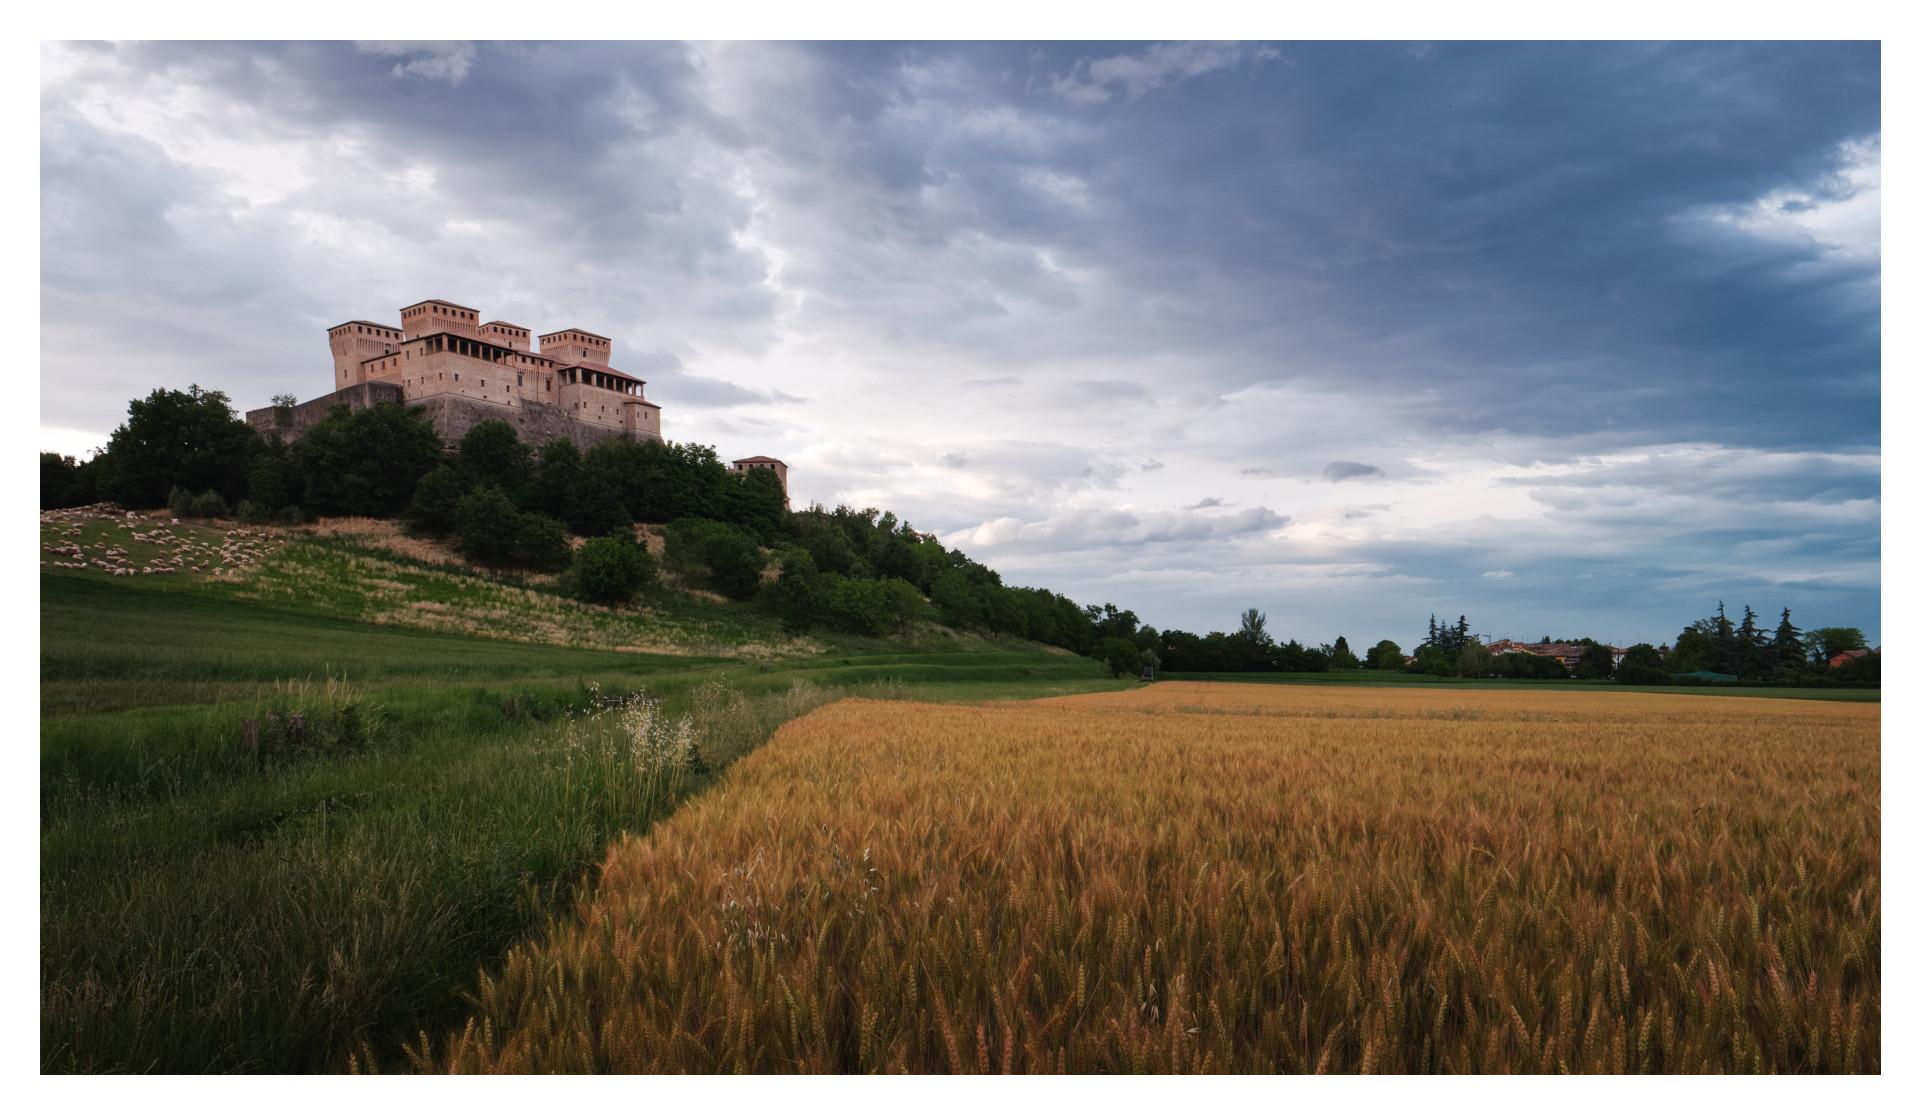 Castello di Torrechiara (Parma)...